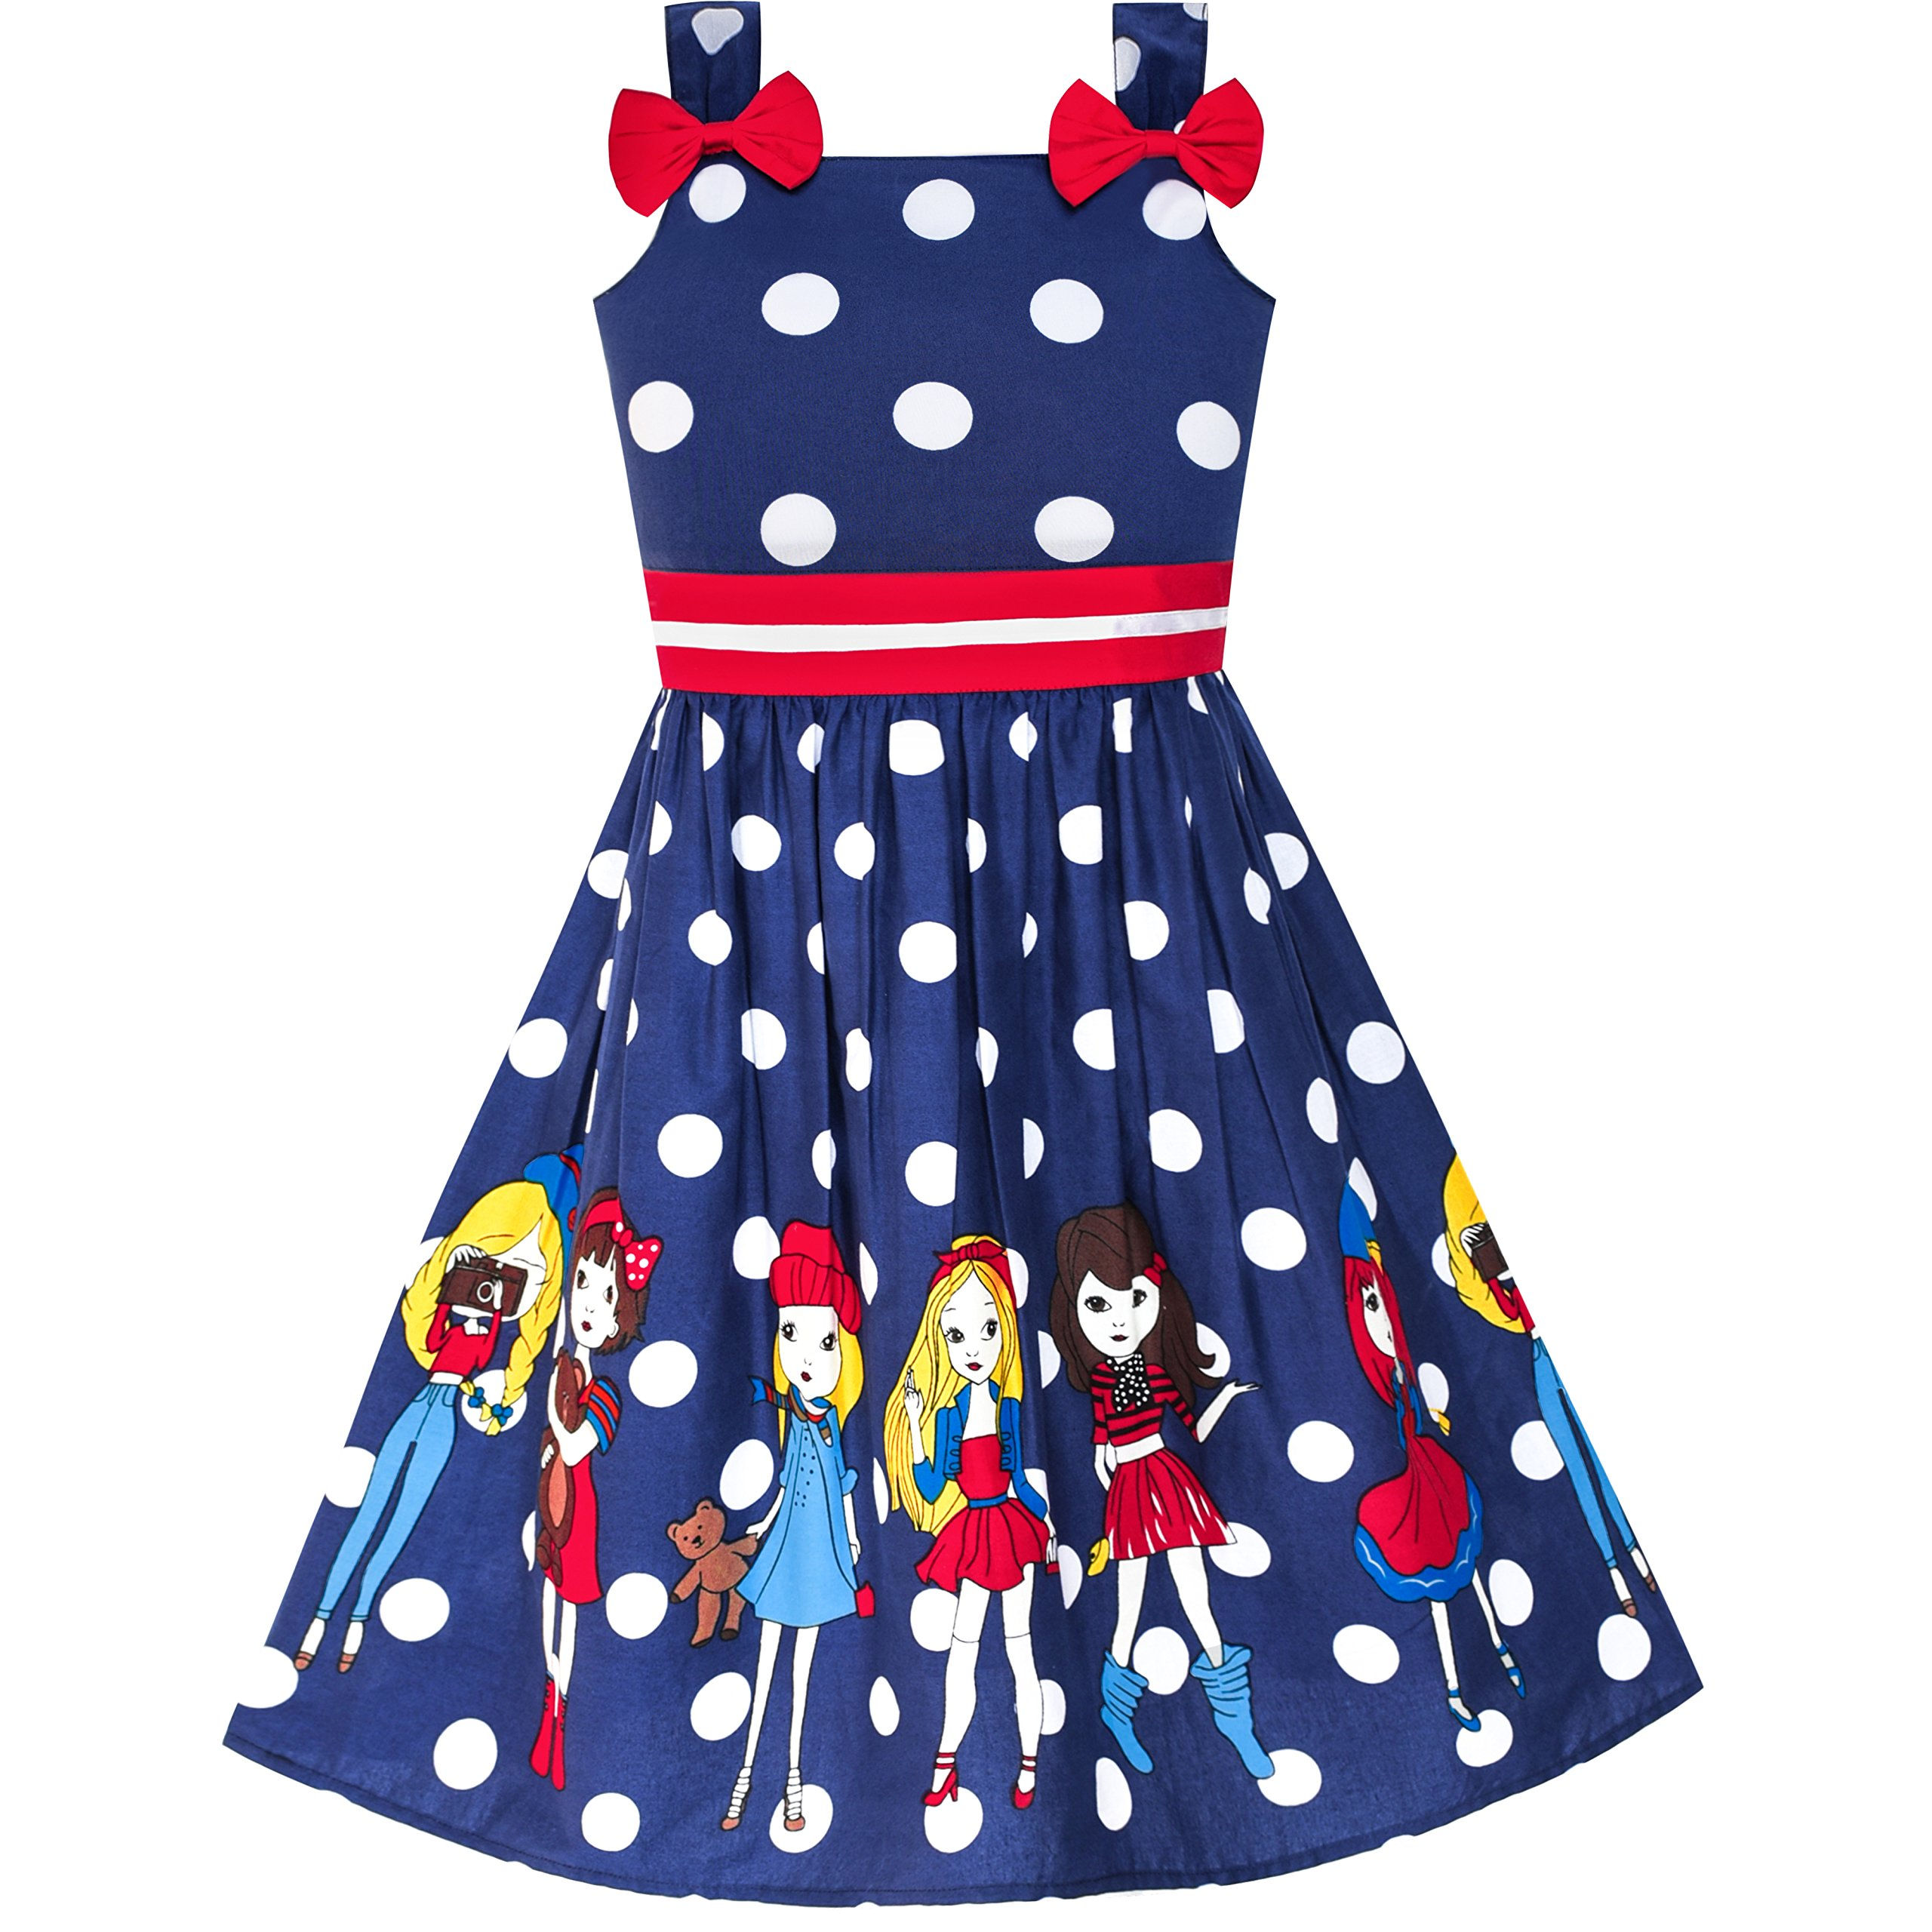 Sunny Fashion LY91 Girls Dress Cartoon Navy Blue Dot Bow Tie Summer Size 2-3